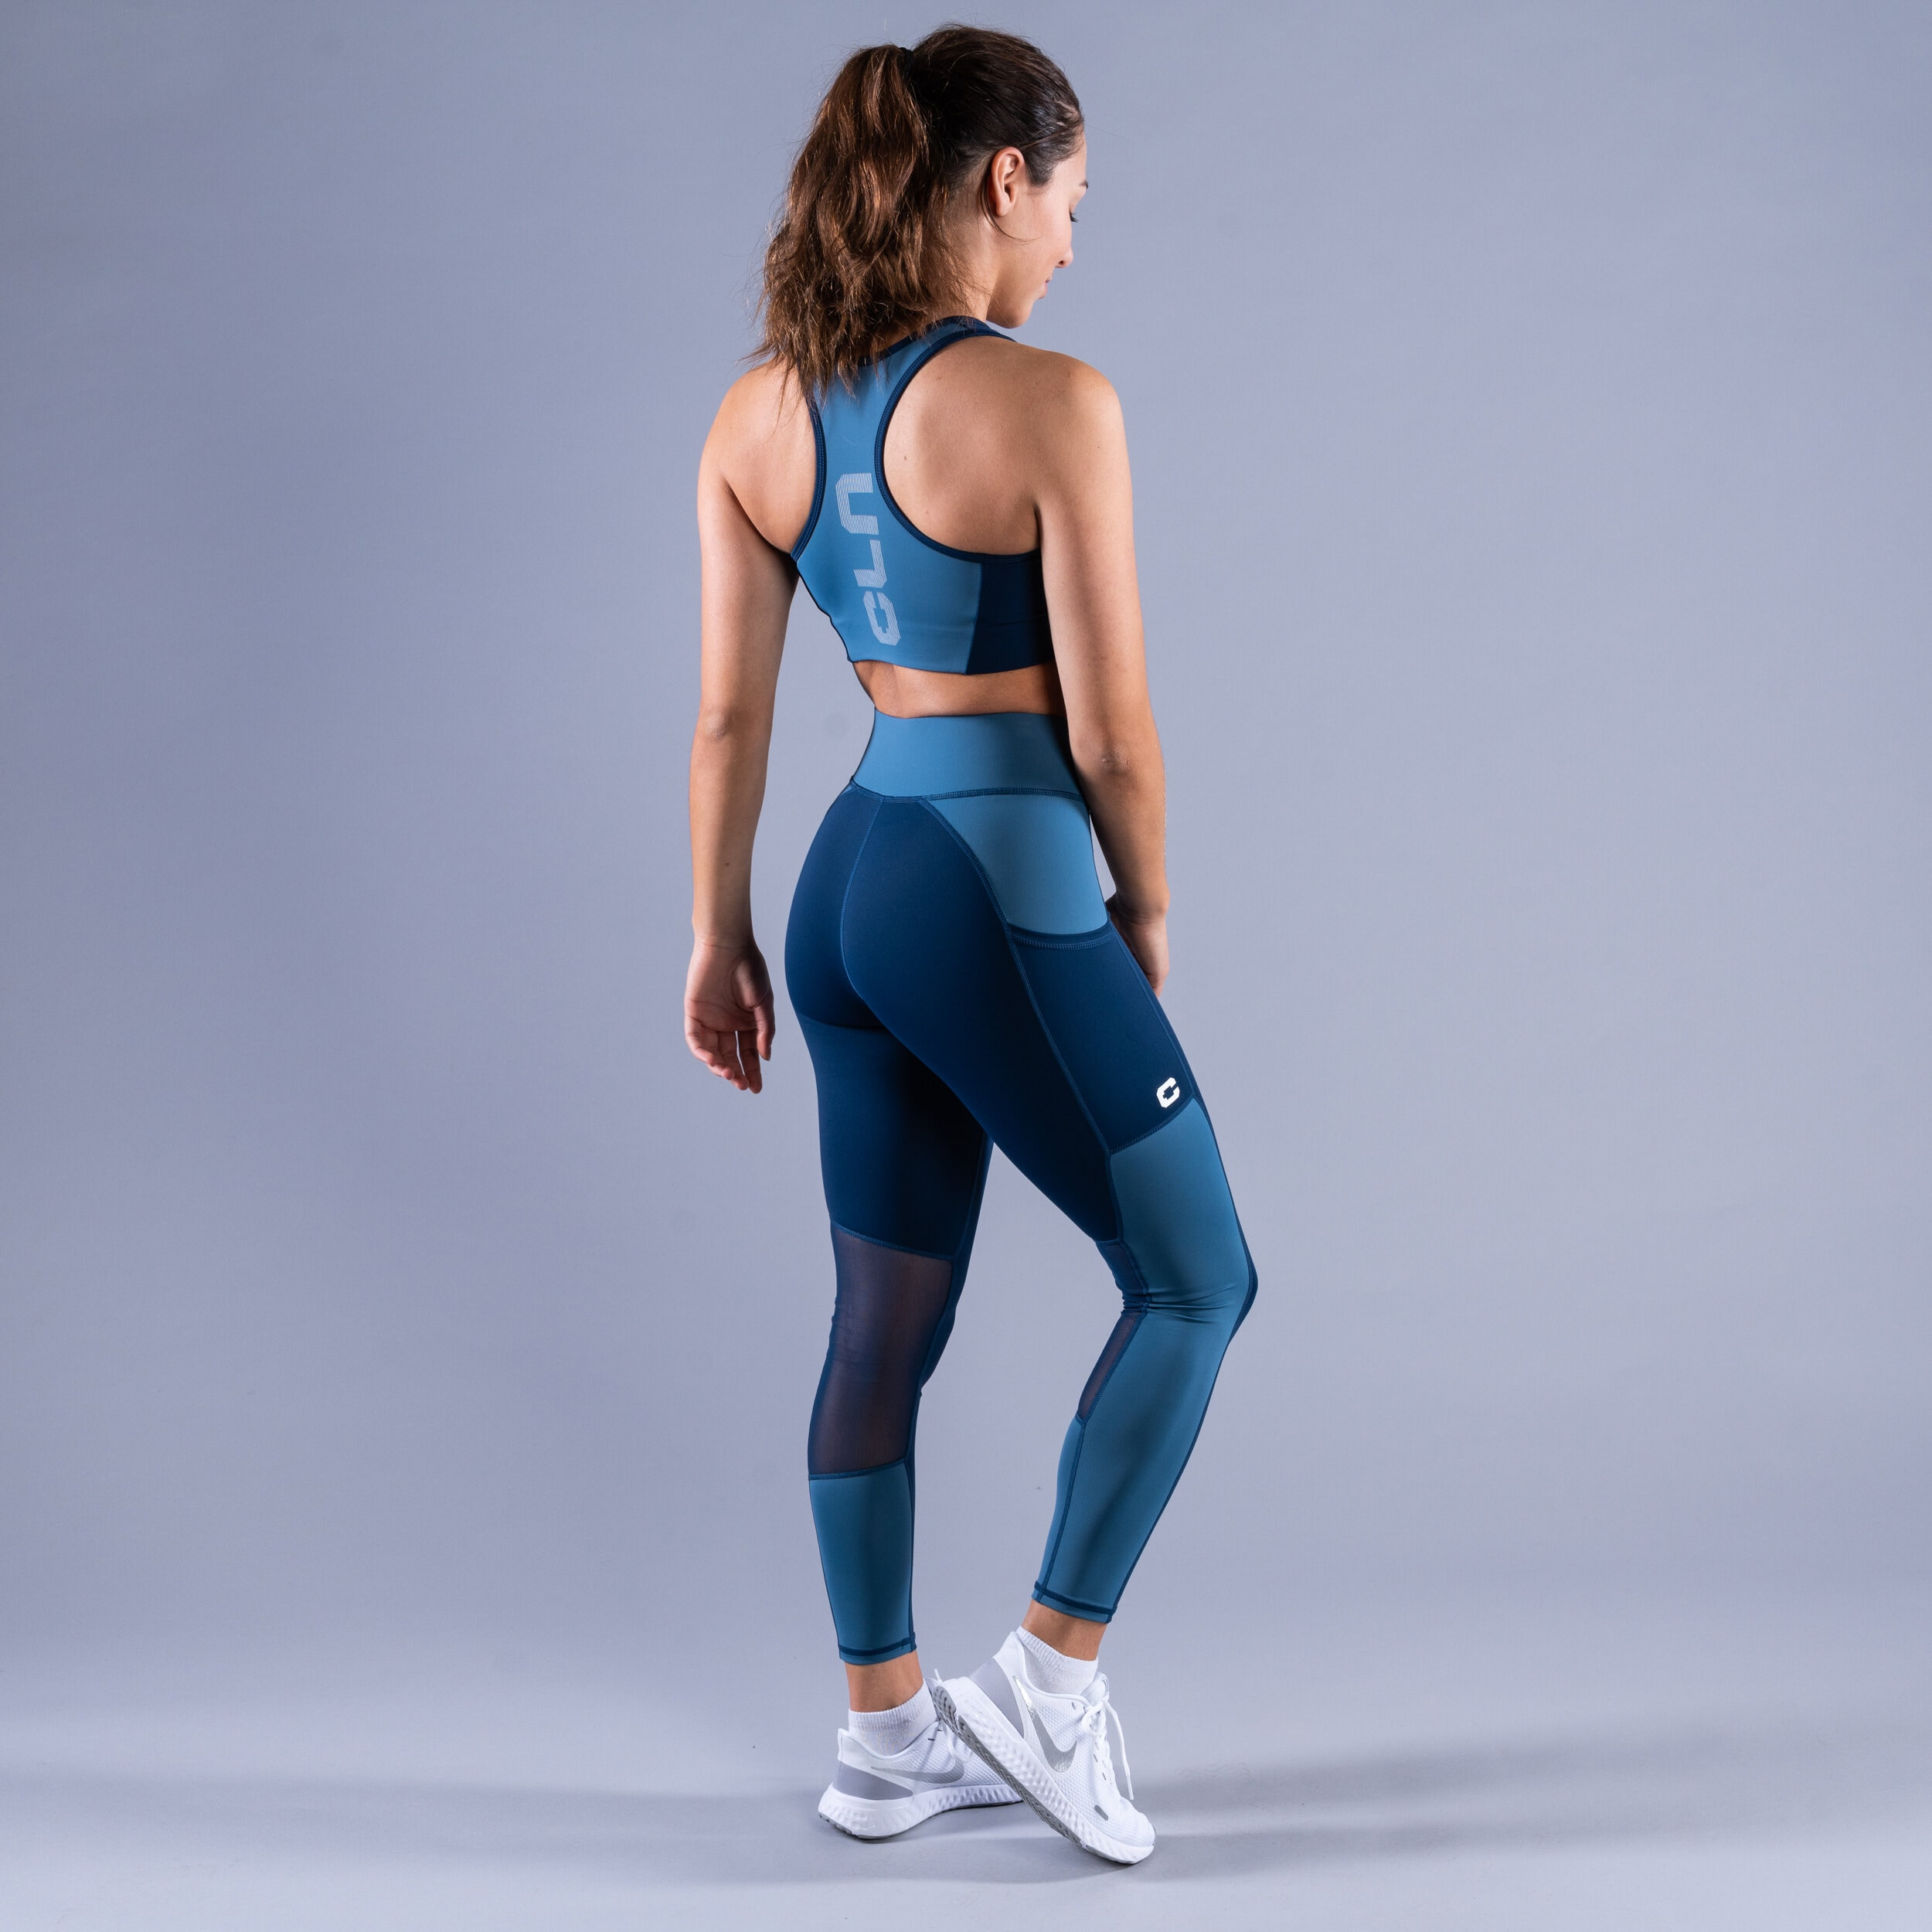 Freedom tights - Intense sport bra Package Blue